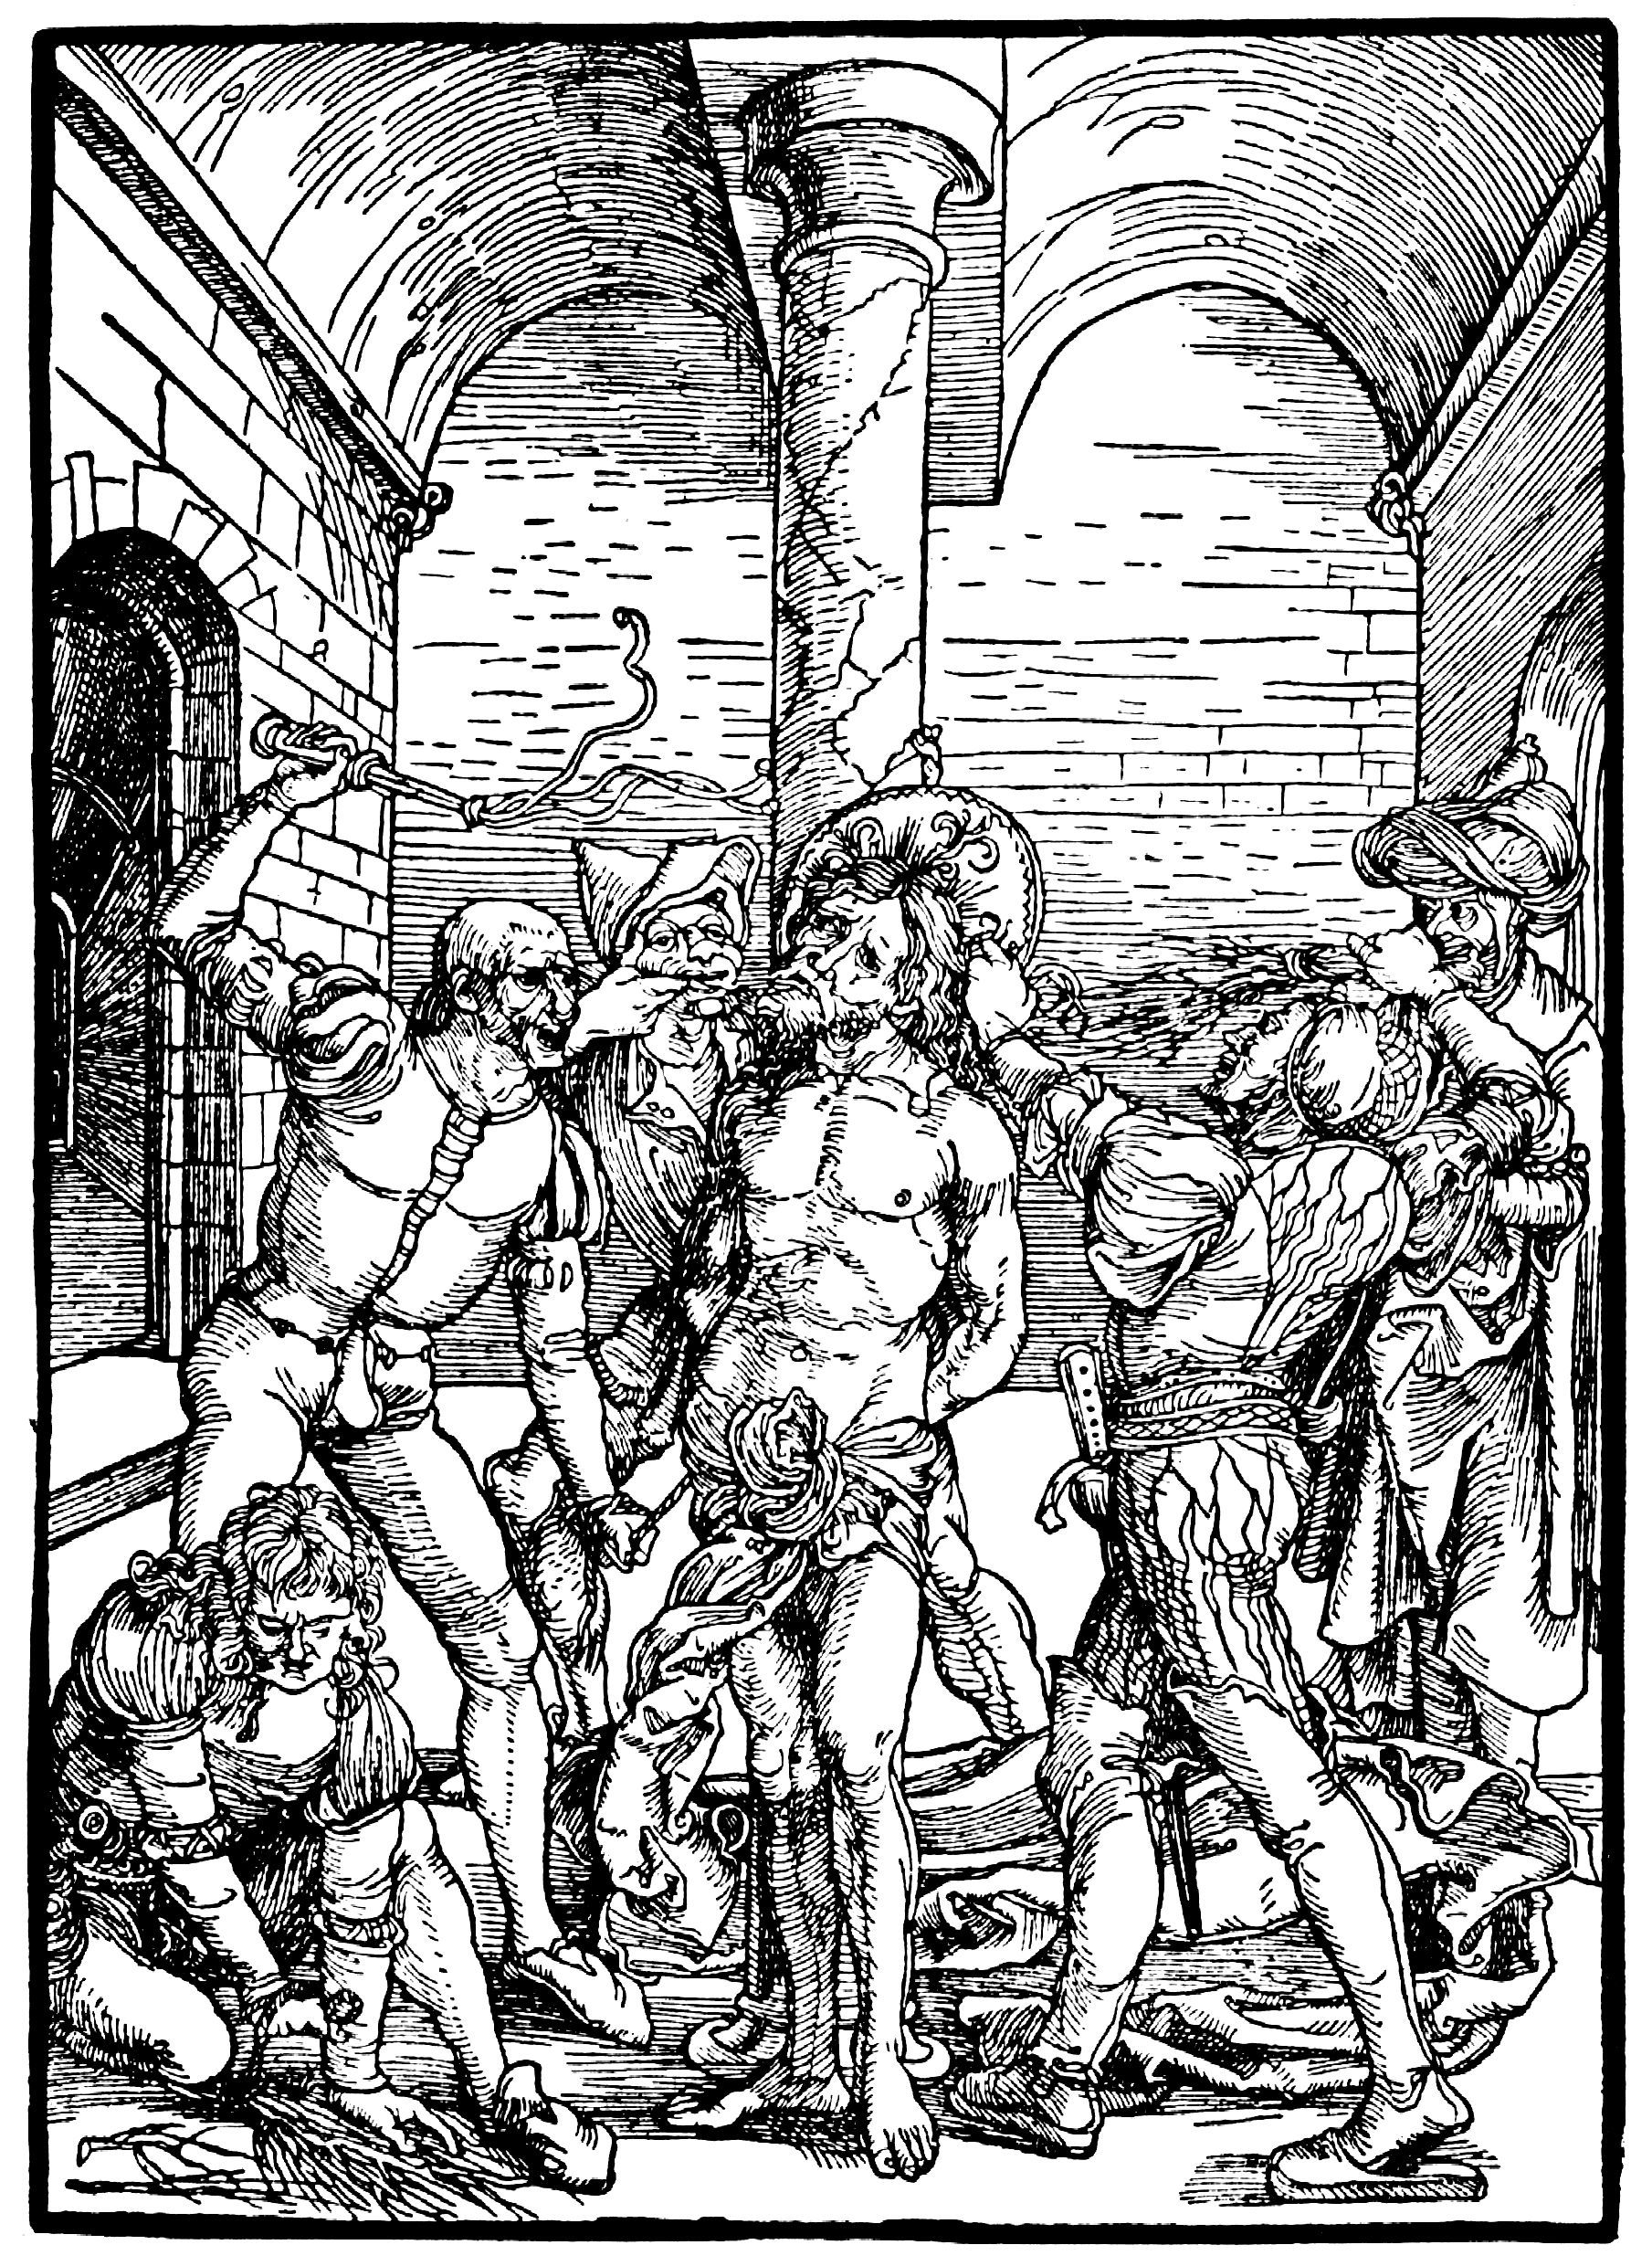 artist durer albrecht title die albertina passion szene geisselung christi date ca 1495 1497 druckgrafik holzdruck spanischer maler moderne kunst afrikanische